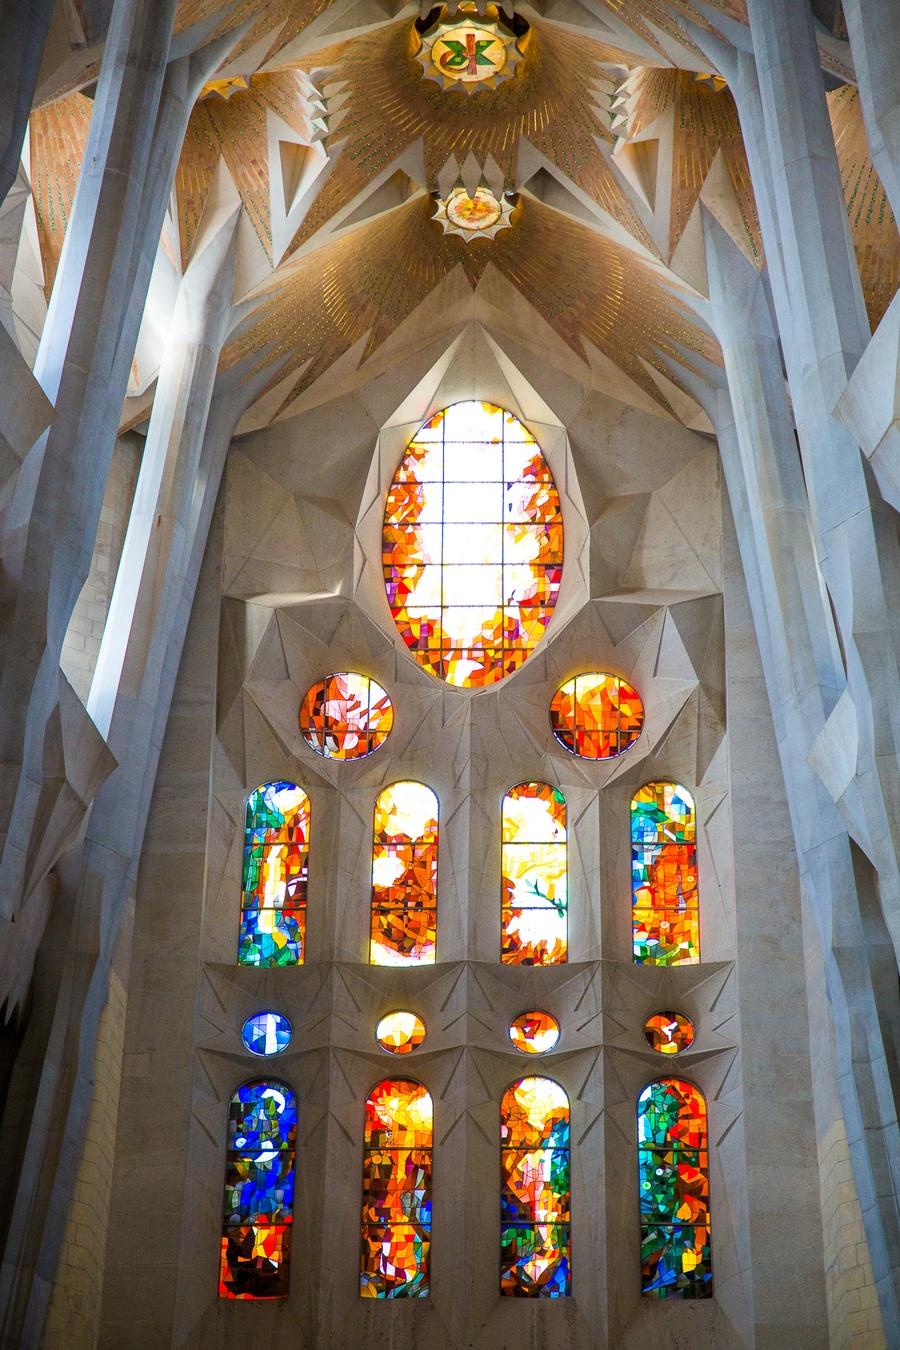 Les vitraux de la Sagrada Familia